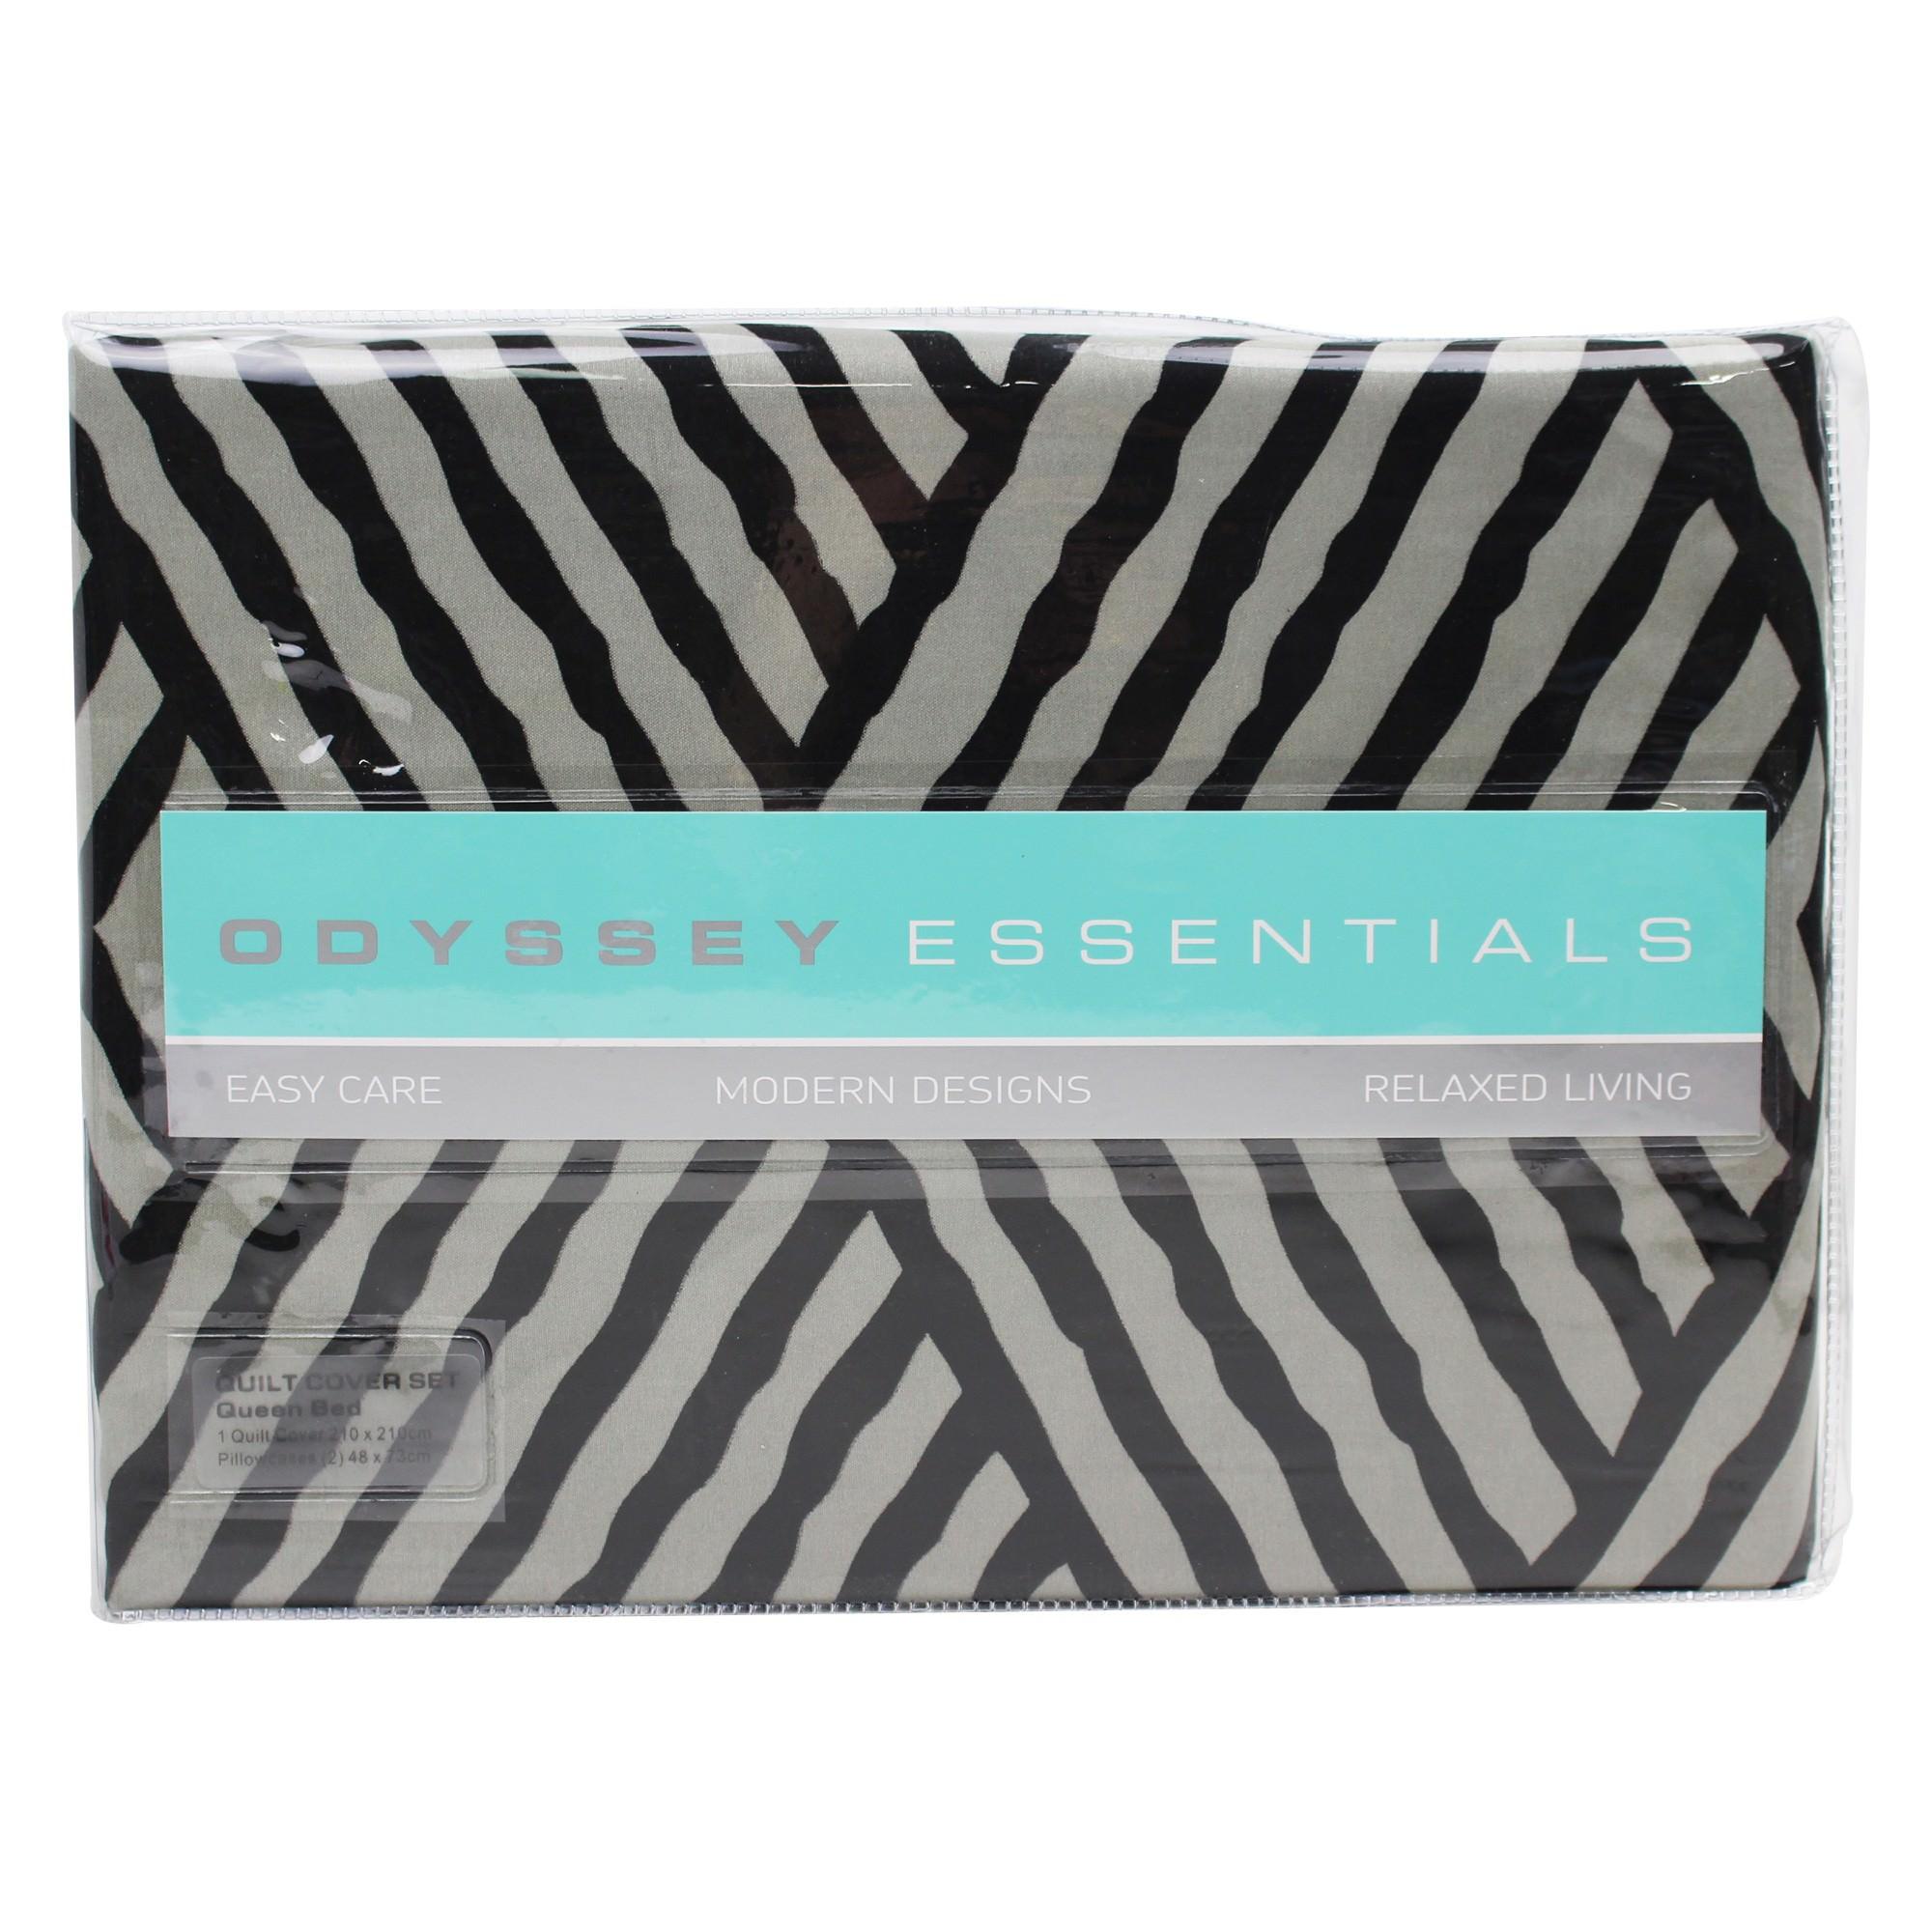 Odyssey Living Hudson Microfibre Quilt Cover Set, Queen